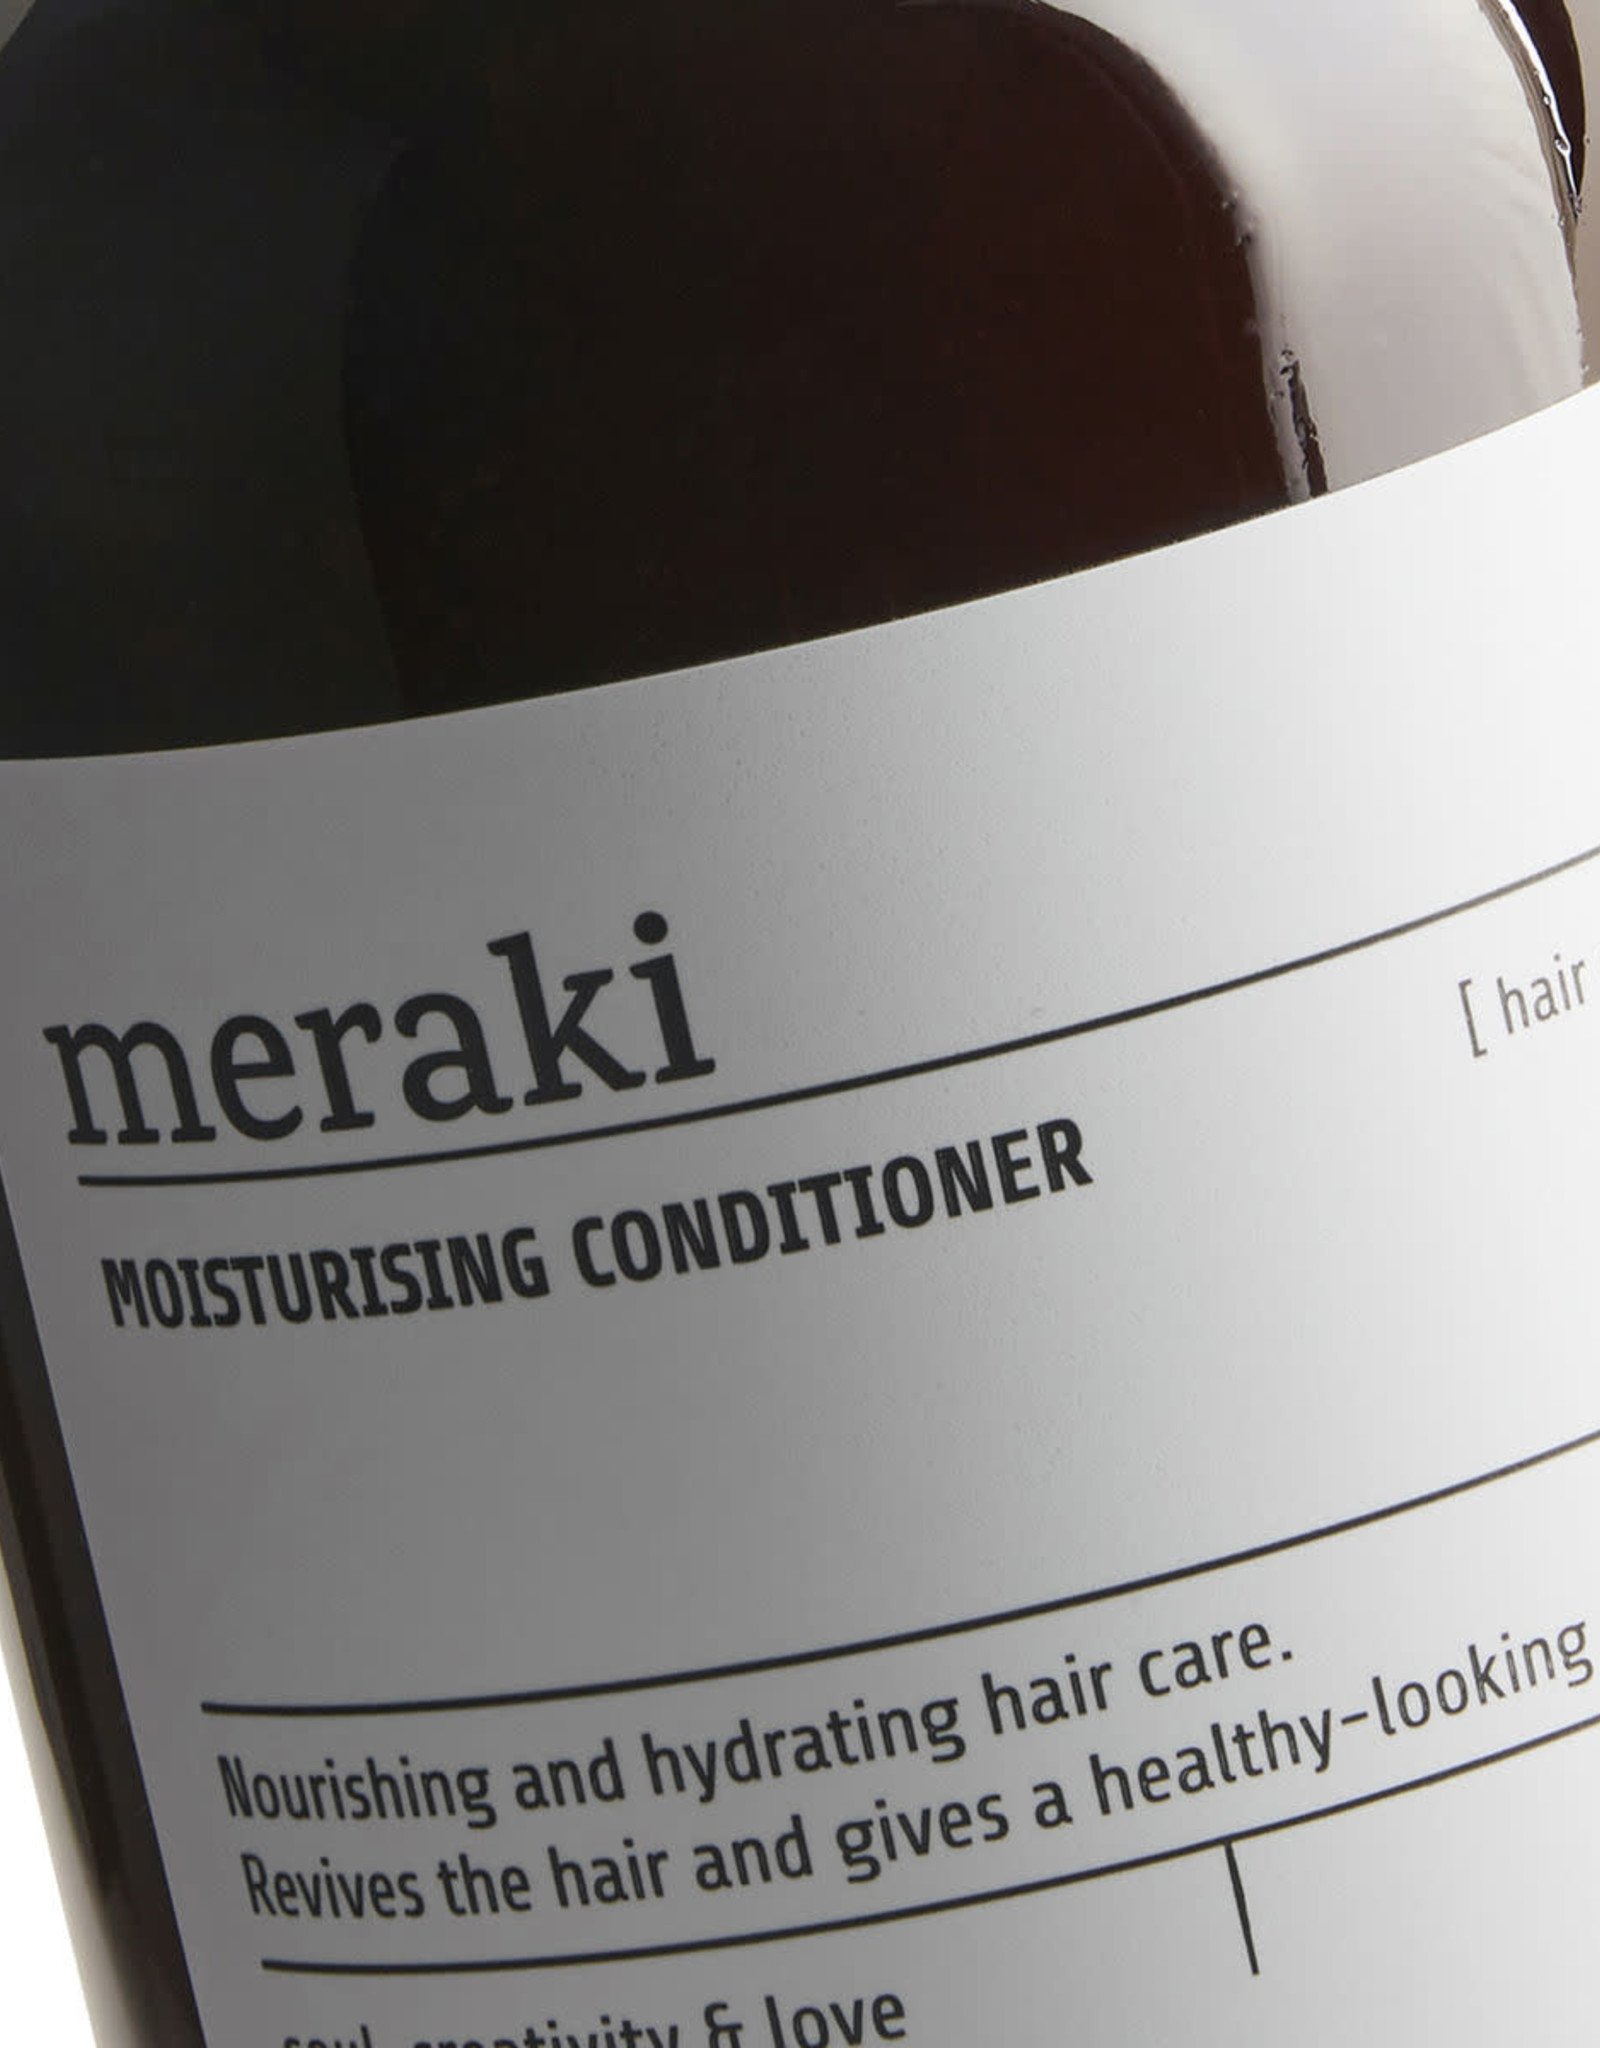 Meraki Meraki - Moisturising conditioner